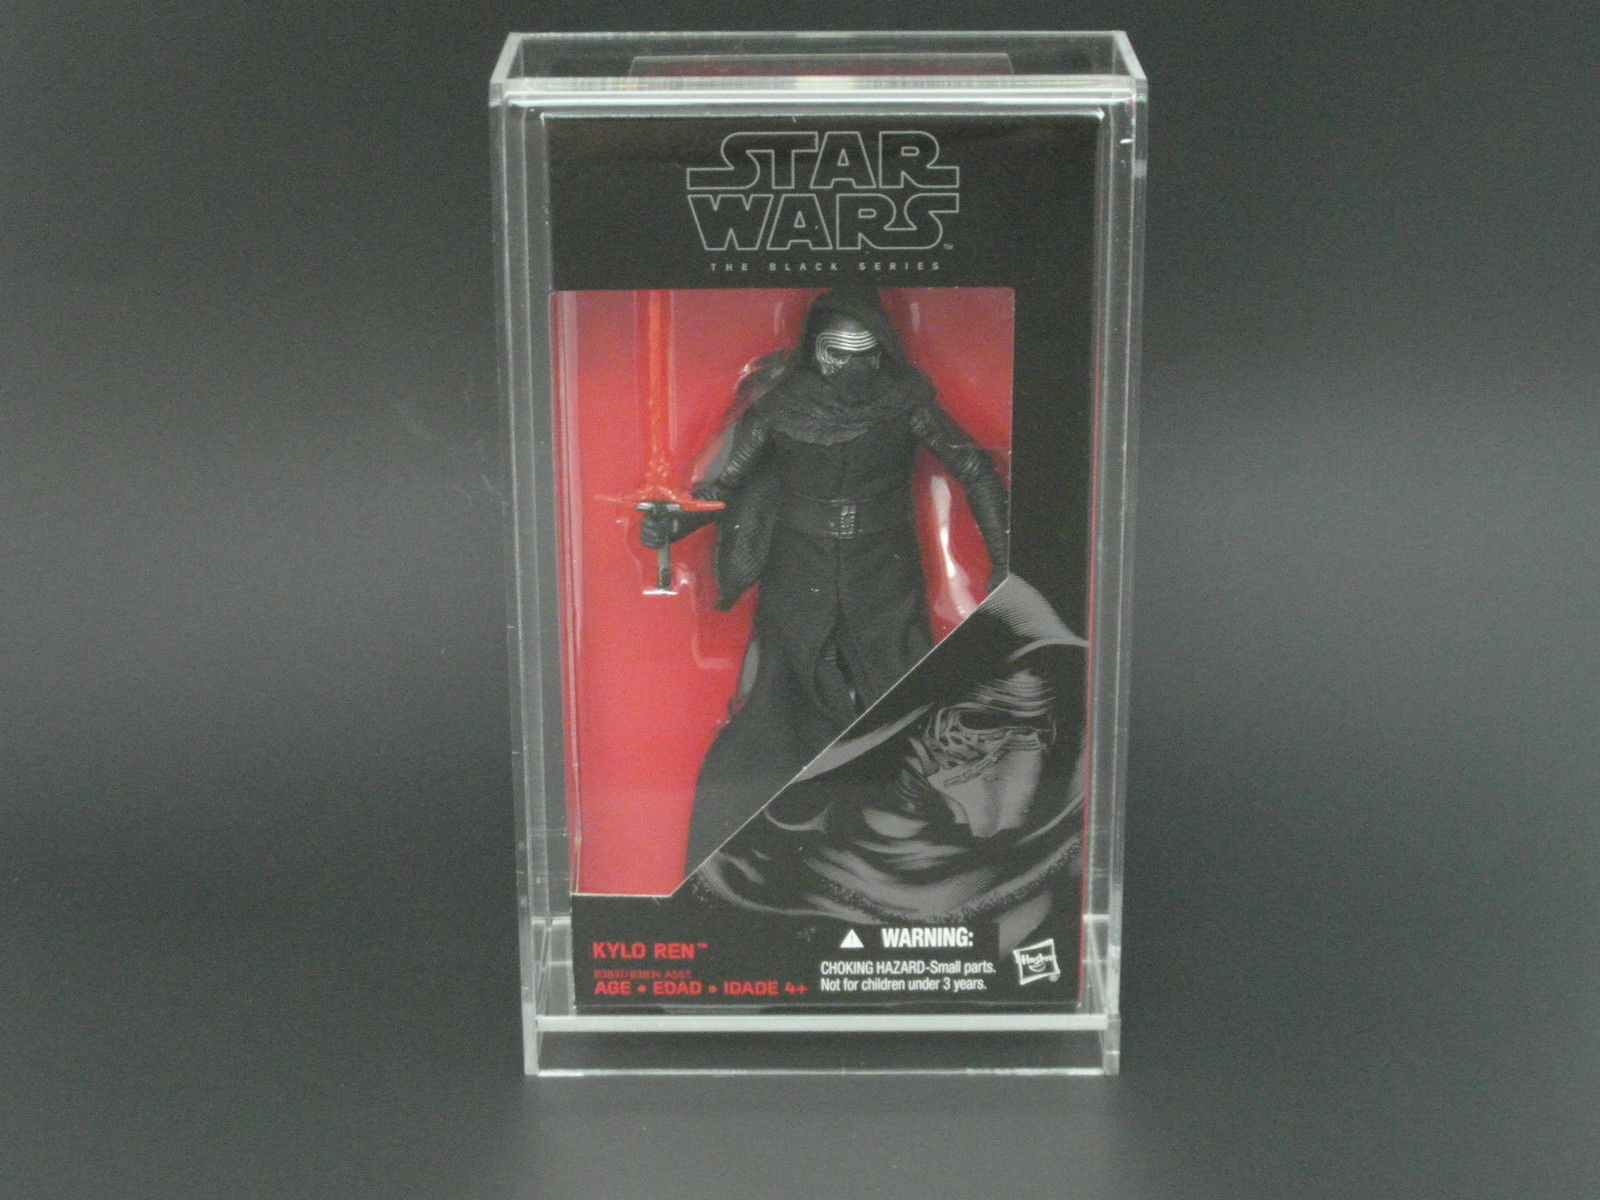 10 x GW Acrylic Display Cases - Boxed 6  Star Wars Black Series (AVC-001)